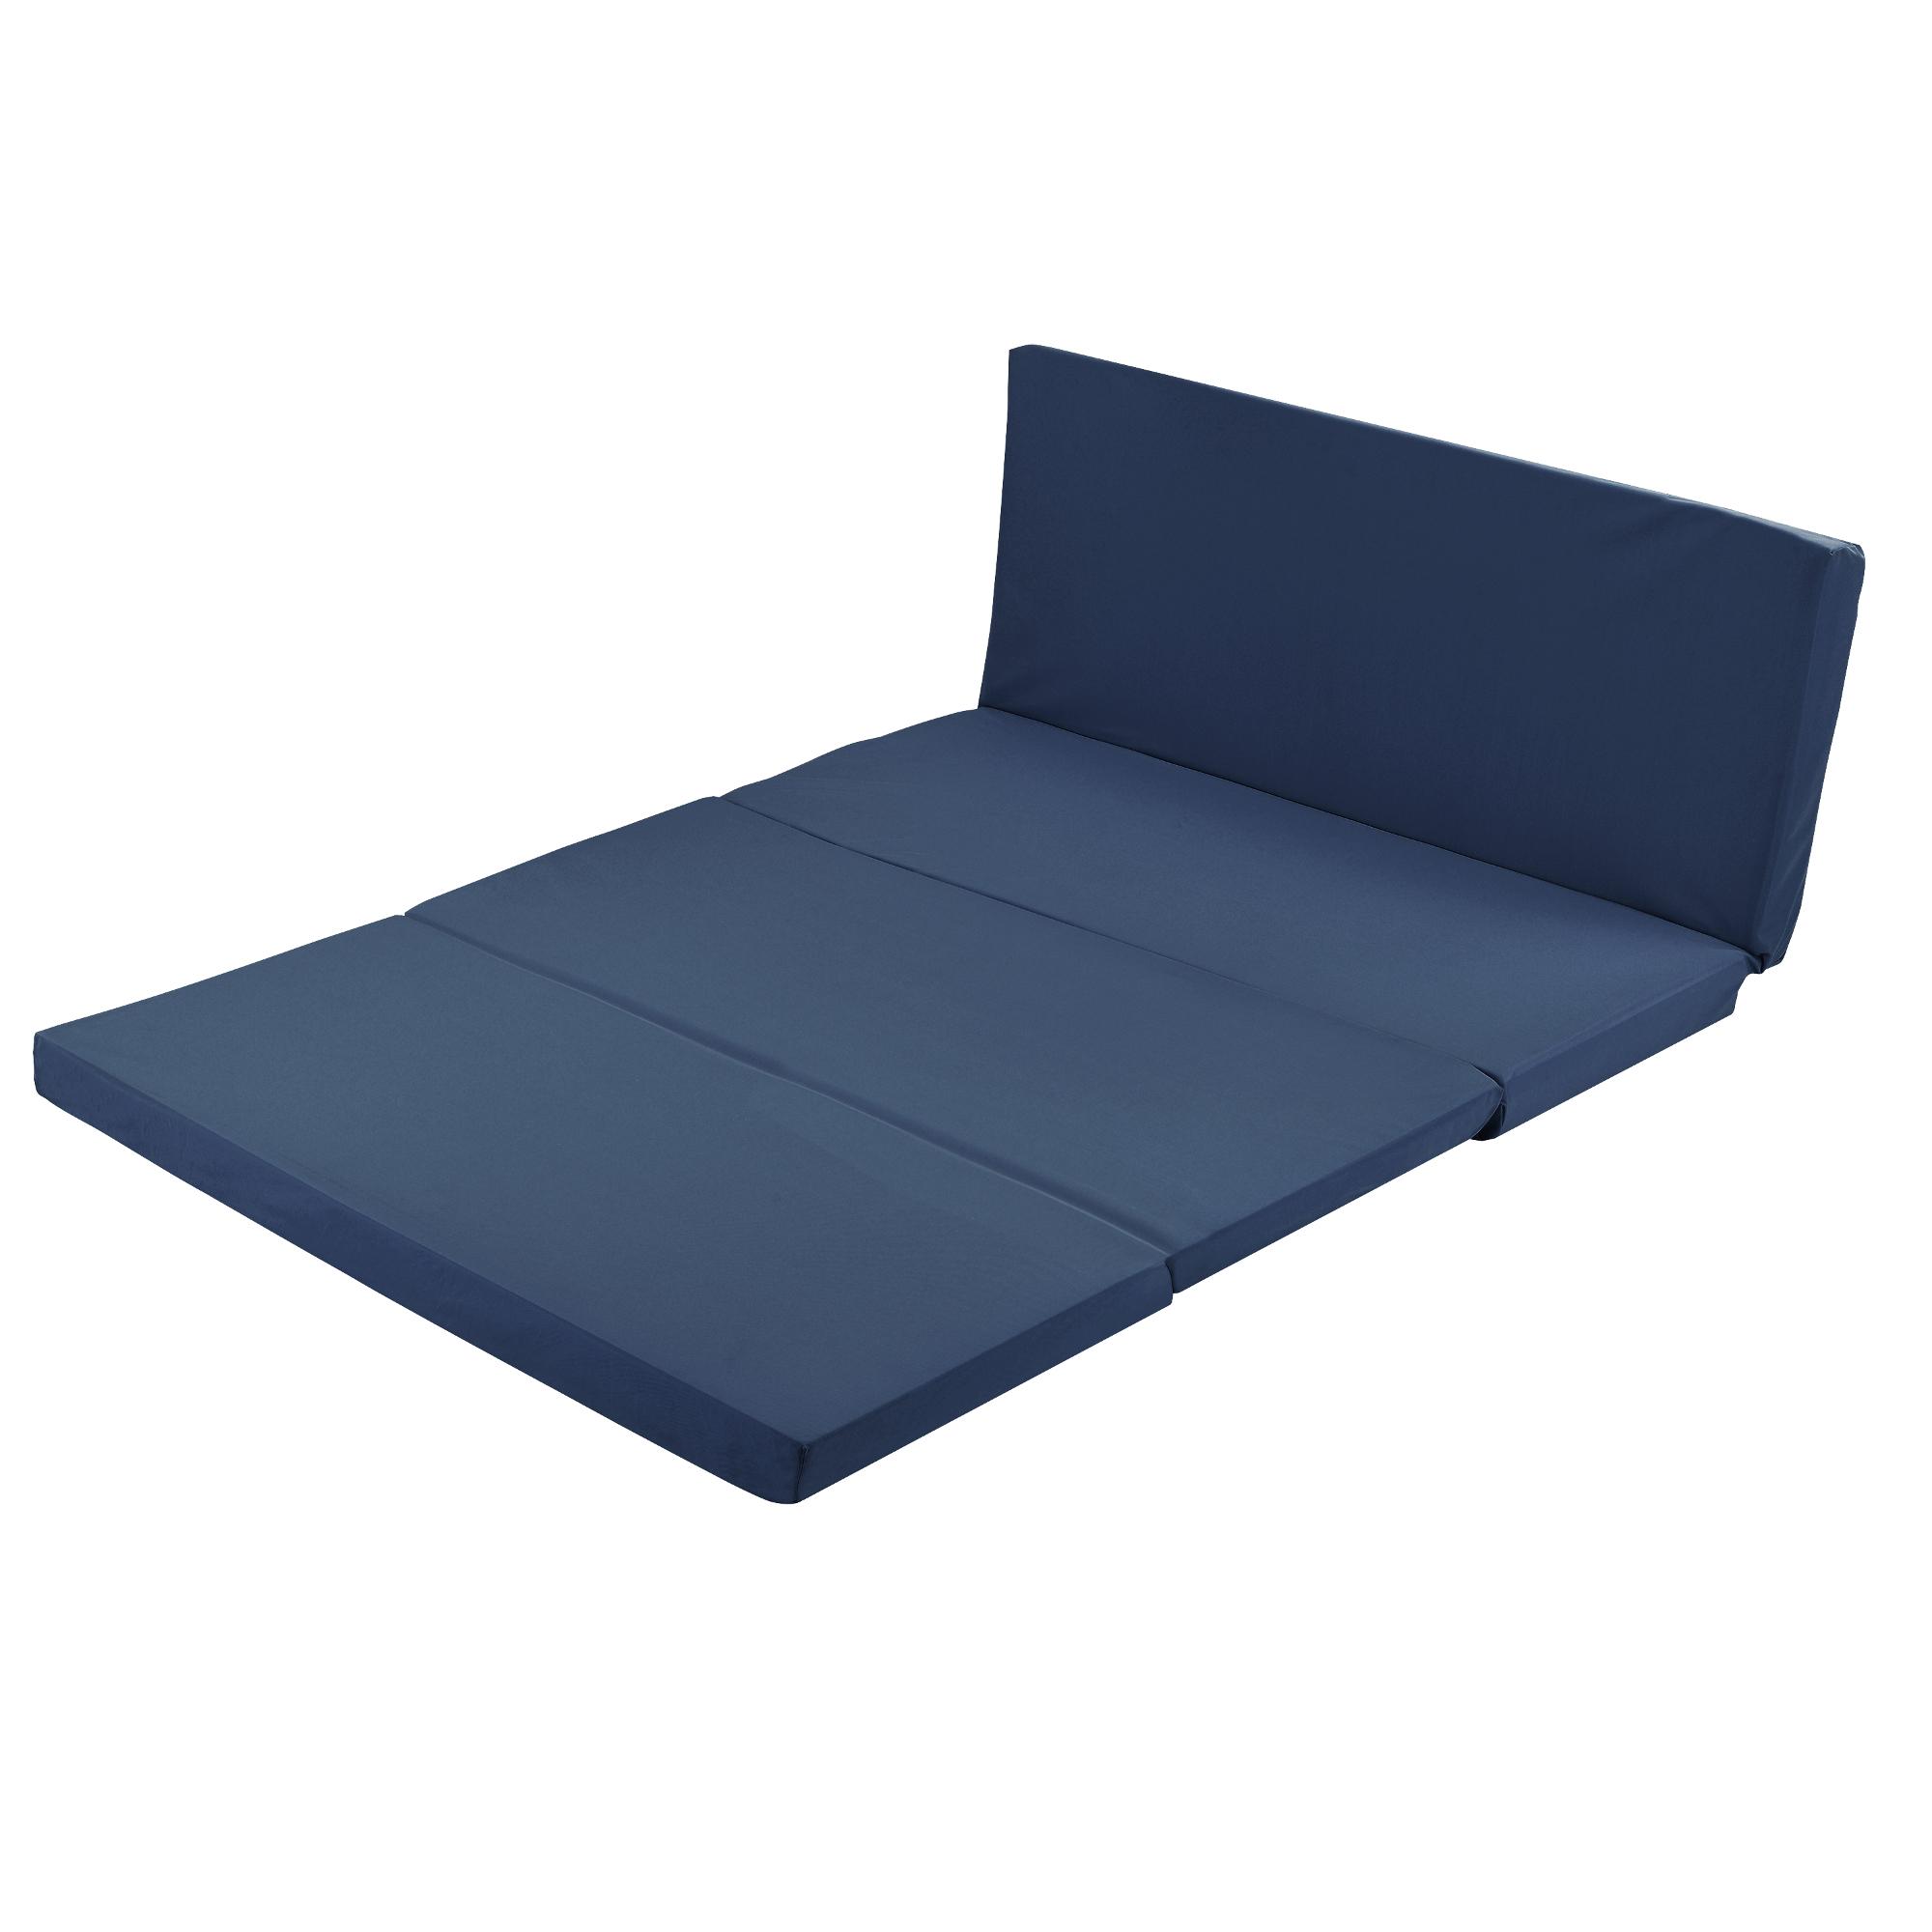 klappmatratze 190x120cm blau faltmatratze. Black Bedroom Furniture Sets. Home Design Ideas